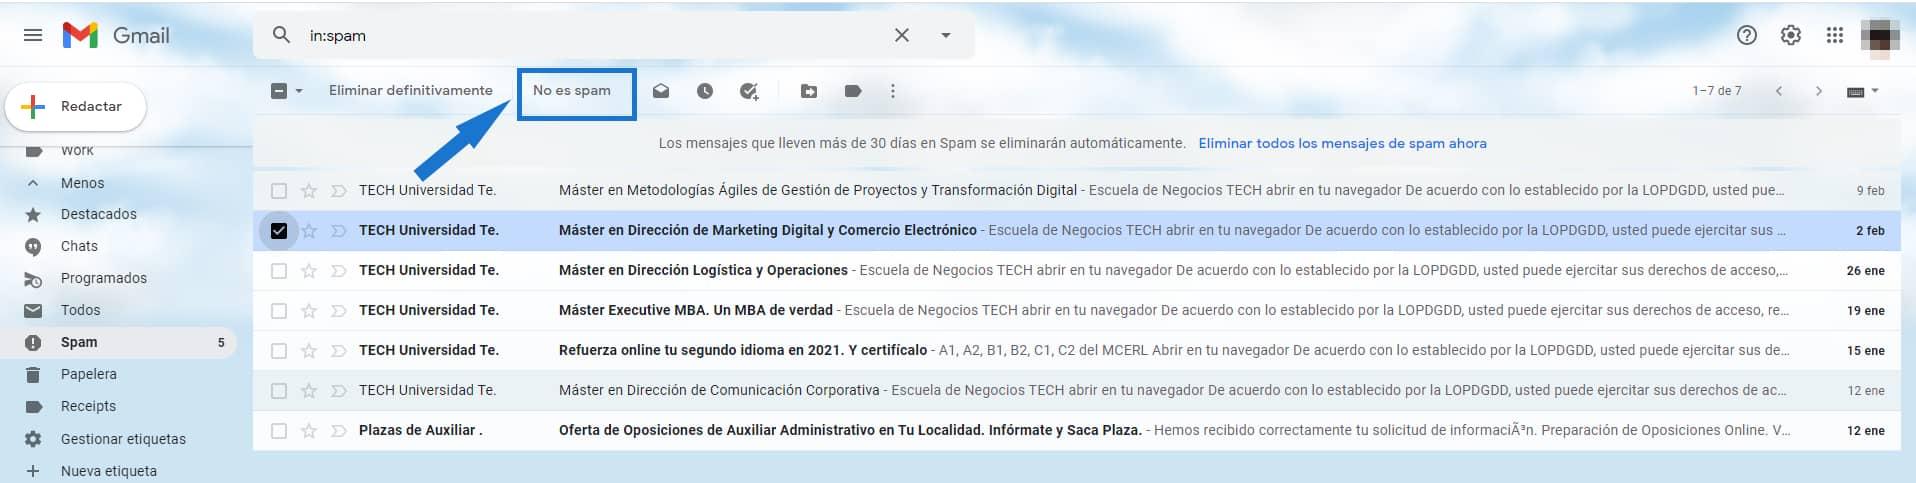 Recuperar un mensaje spam